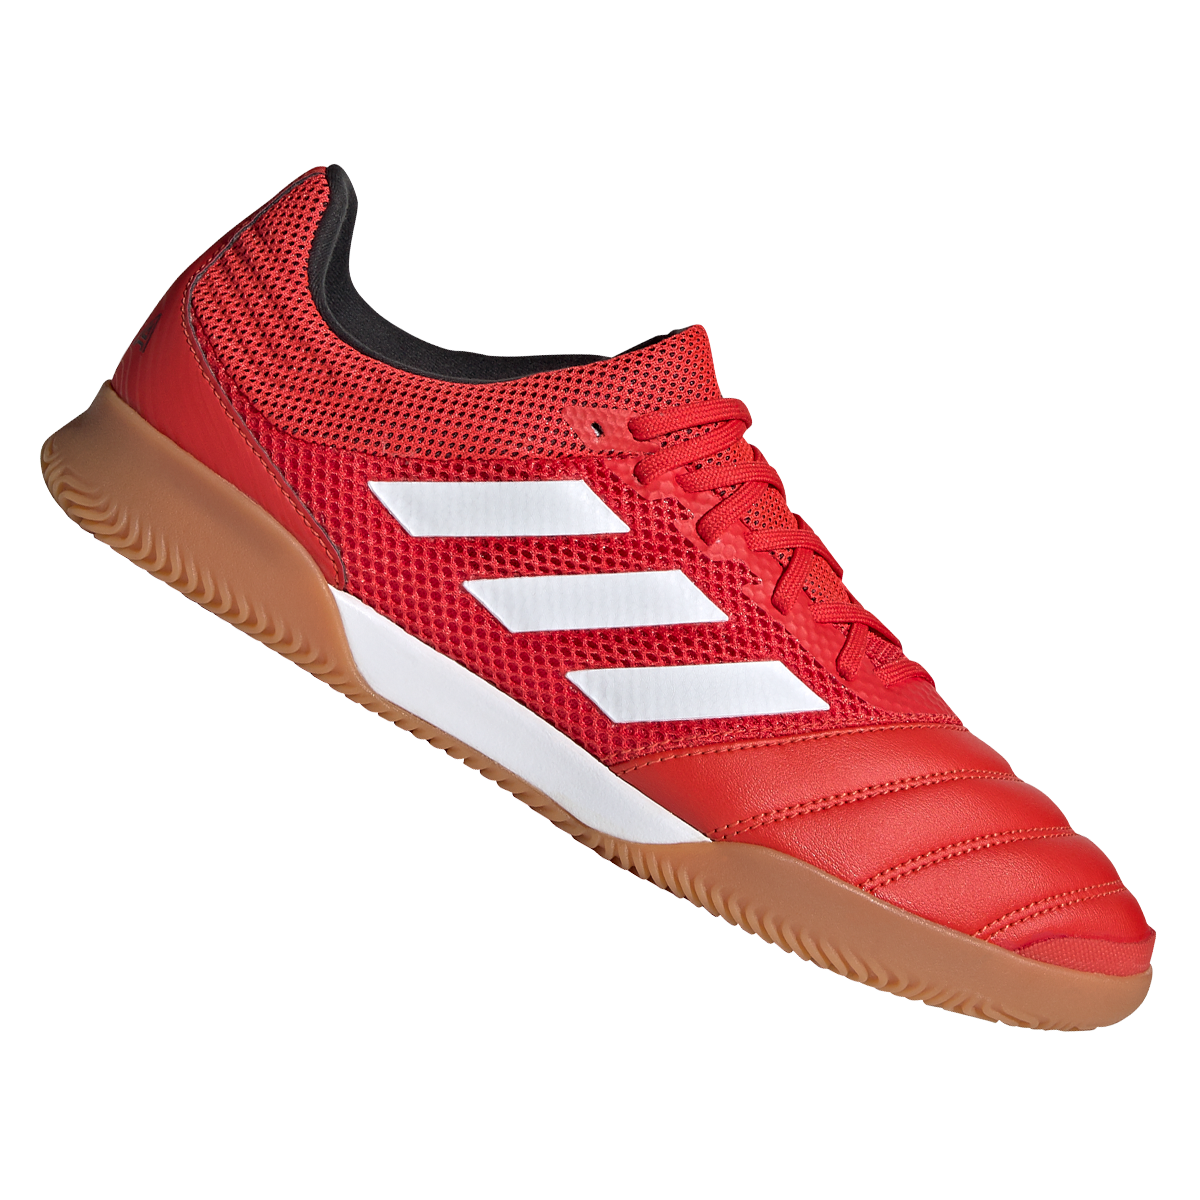 adidas Hallenschuh Copa 20.3 IN Sala rotweiß